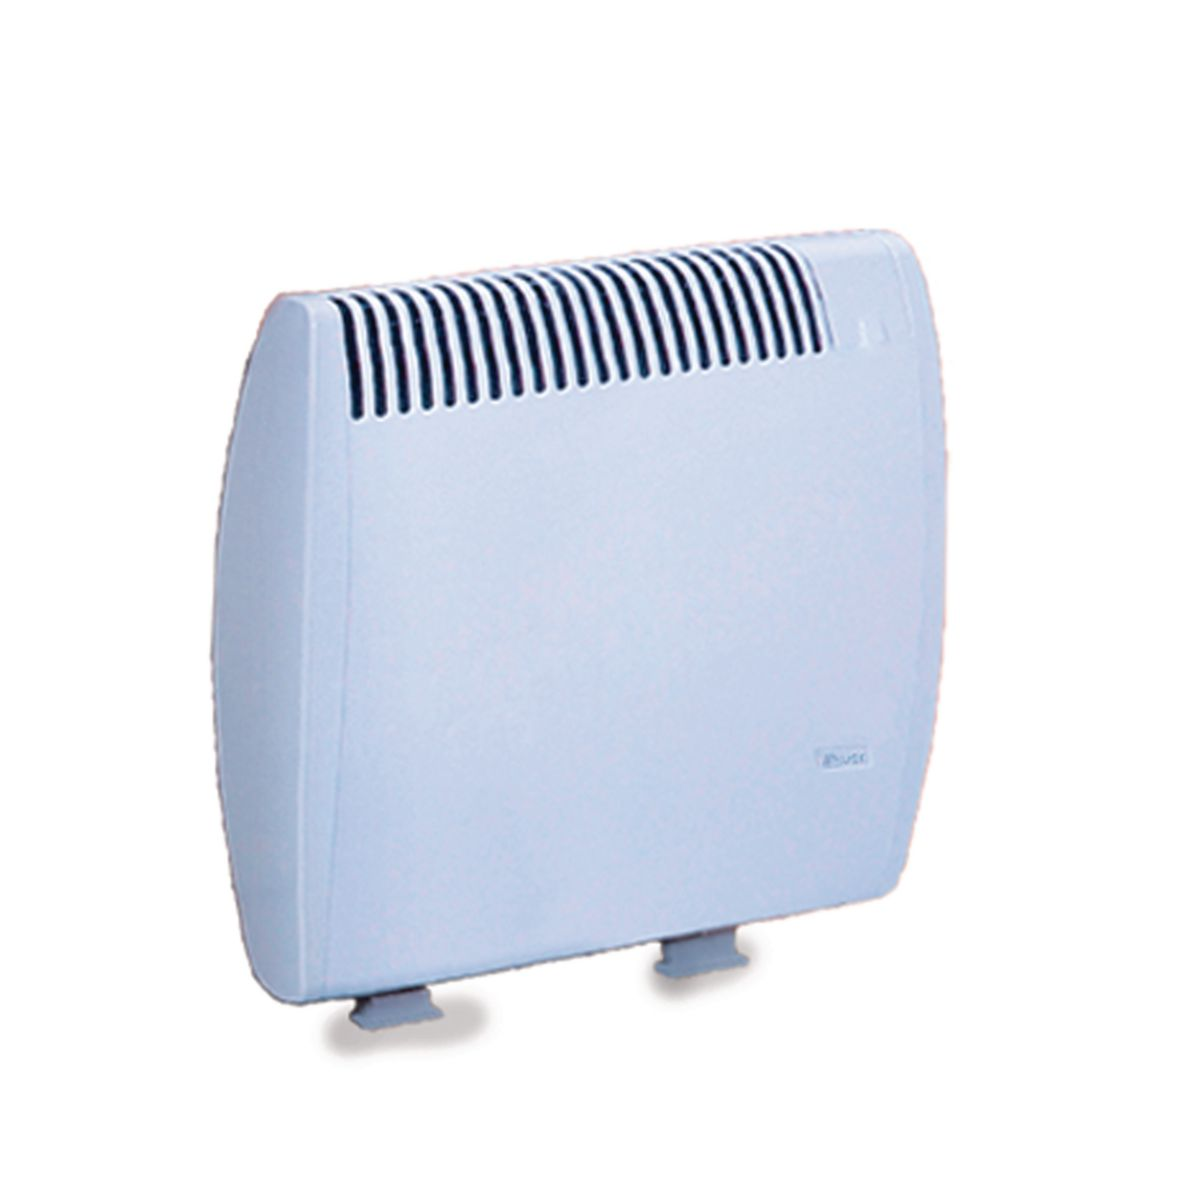 radiateur gaz chemin e gn bp flamme non visible mc 430 r f 212114 auer gianola. Black Bedroom Furniture Sets. Home Design Ideas